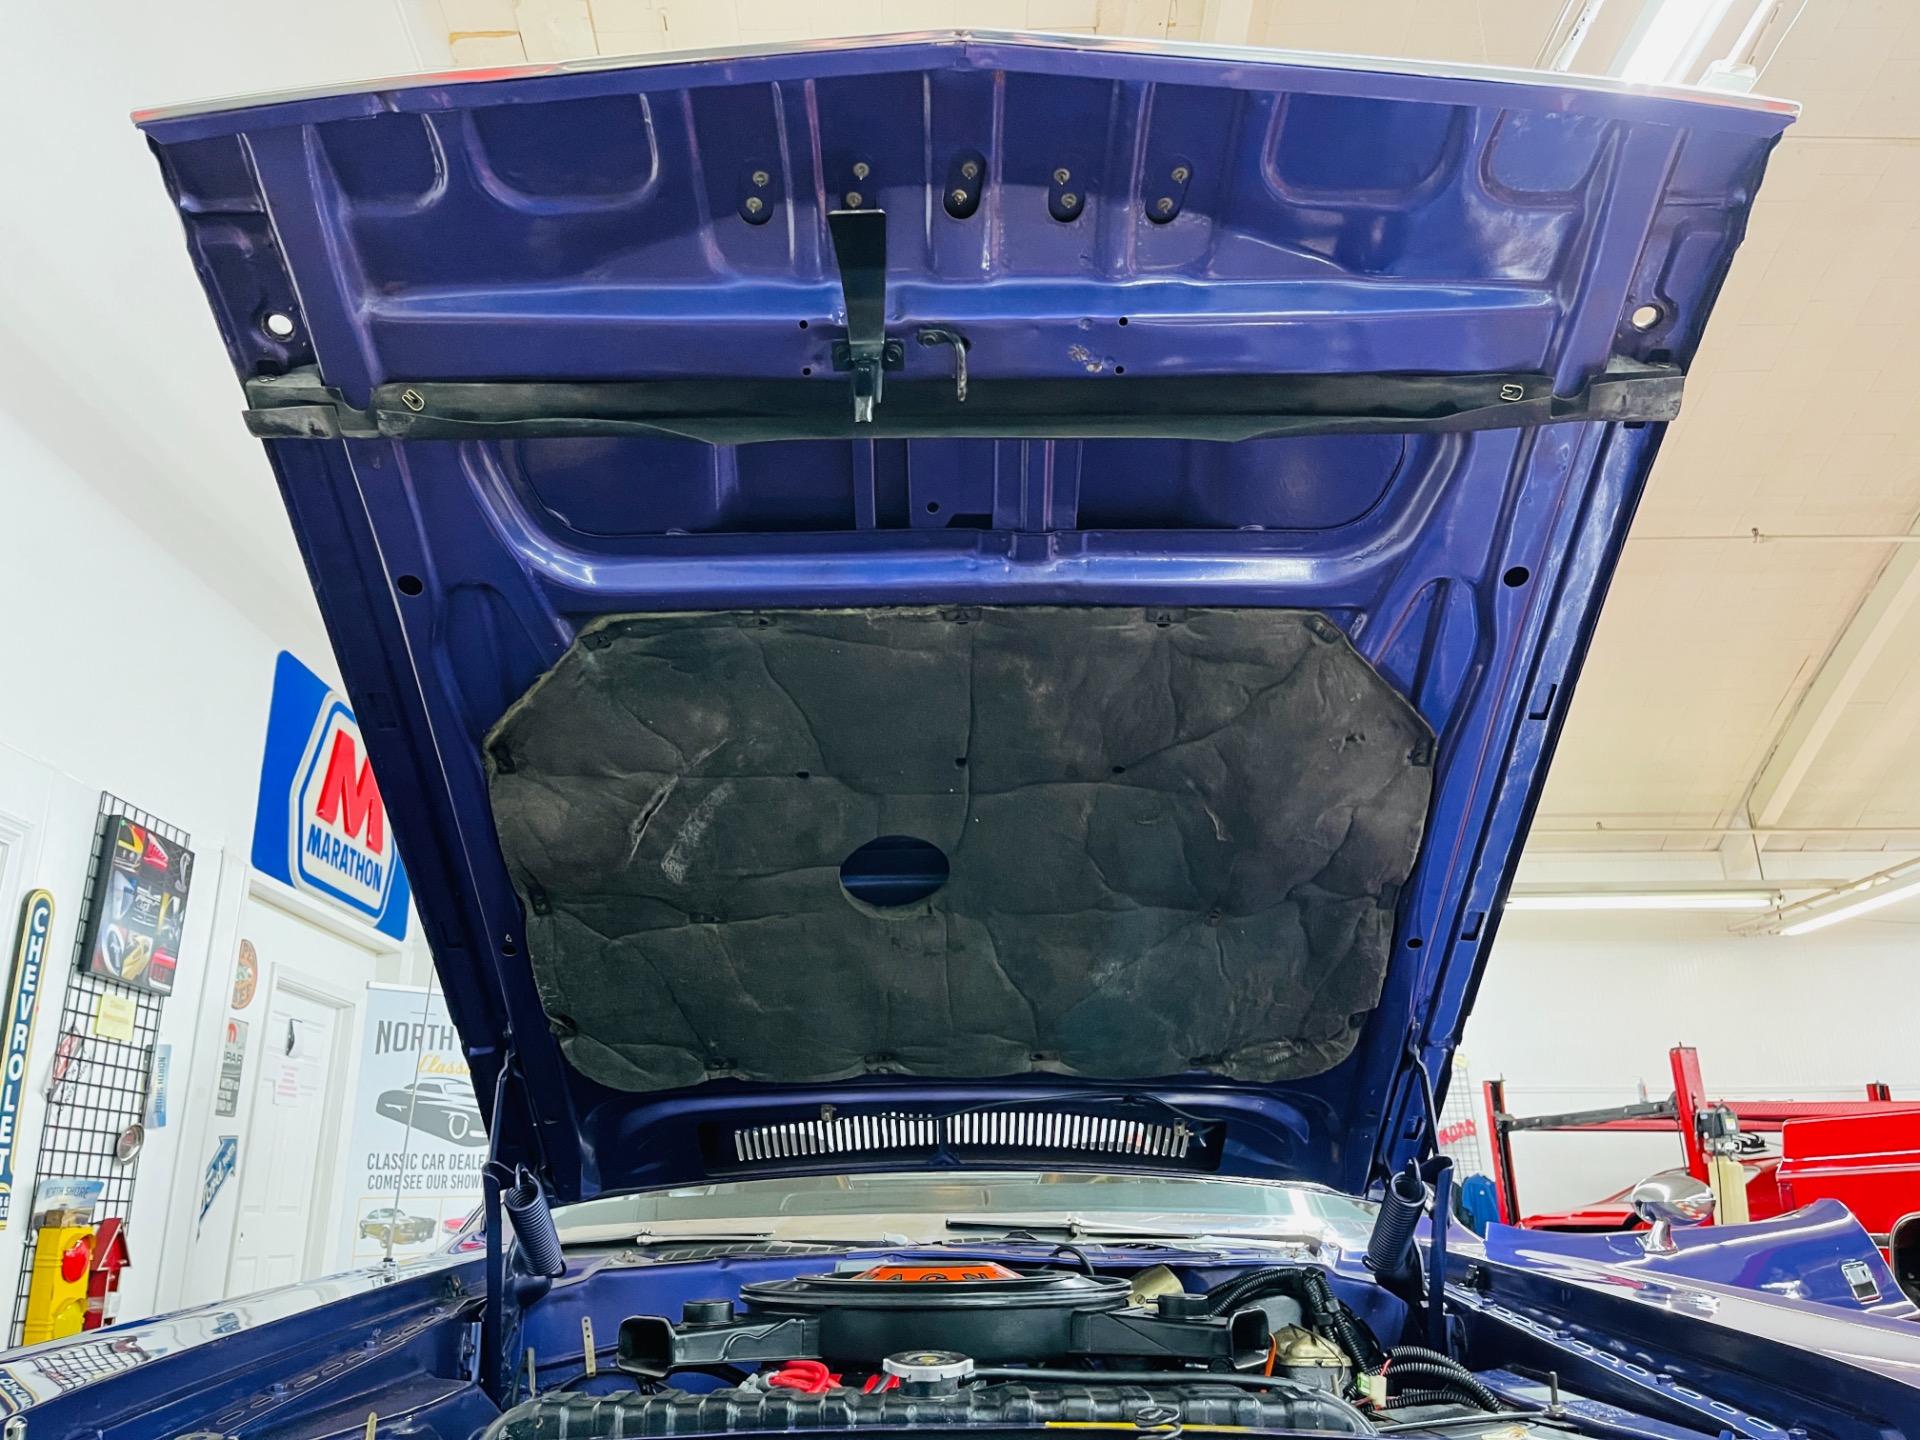 Used 1970 Dodge Challenger - R/T - 383 MAGNUM - FC7 PLUM CRAZY - SEE VIDEO - | Mundelein, IL